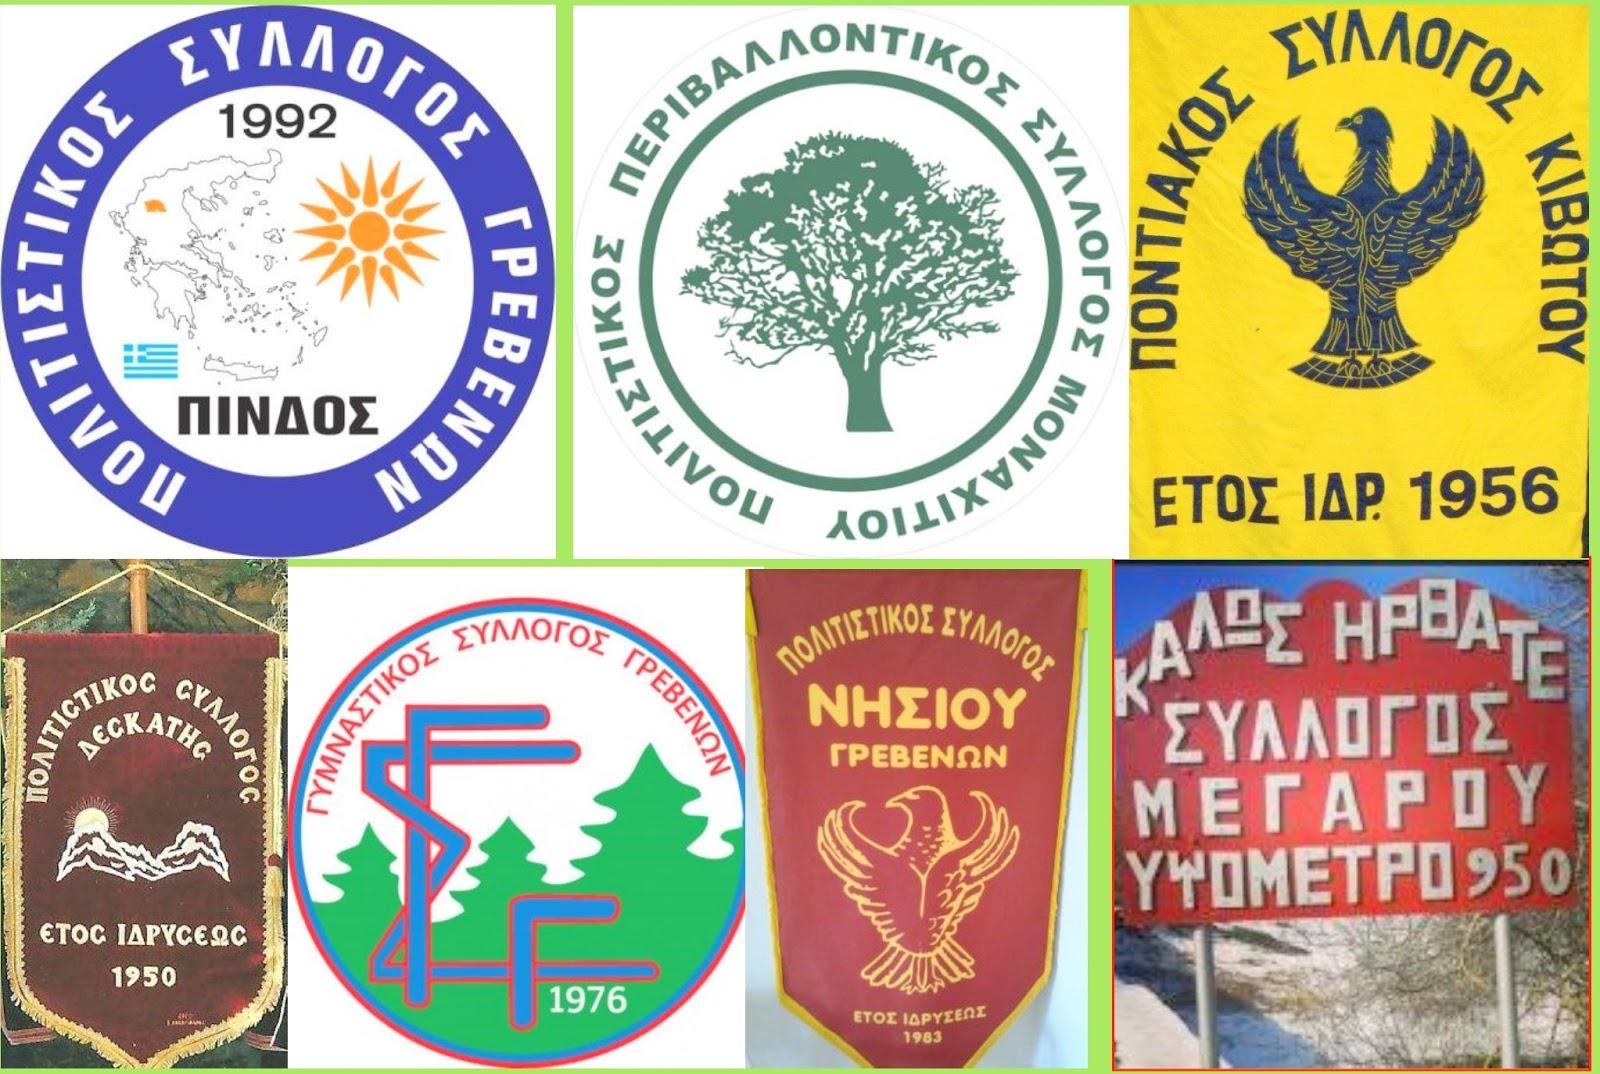 57e560918f Ομάδα του fb  Σύλλογοι Φορείς Λογότυπα Γρεβενών Κοζάνης Σκοπός της ομάδας  είναι η προβολή των δραστηριοτήτων